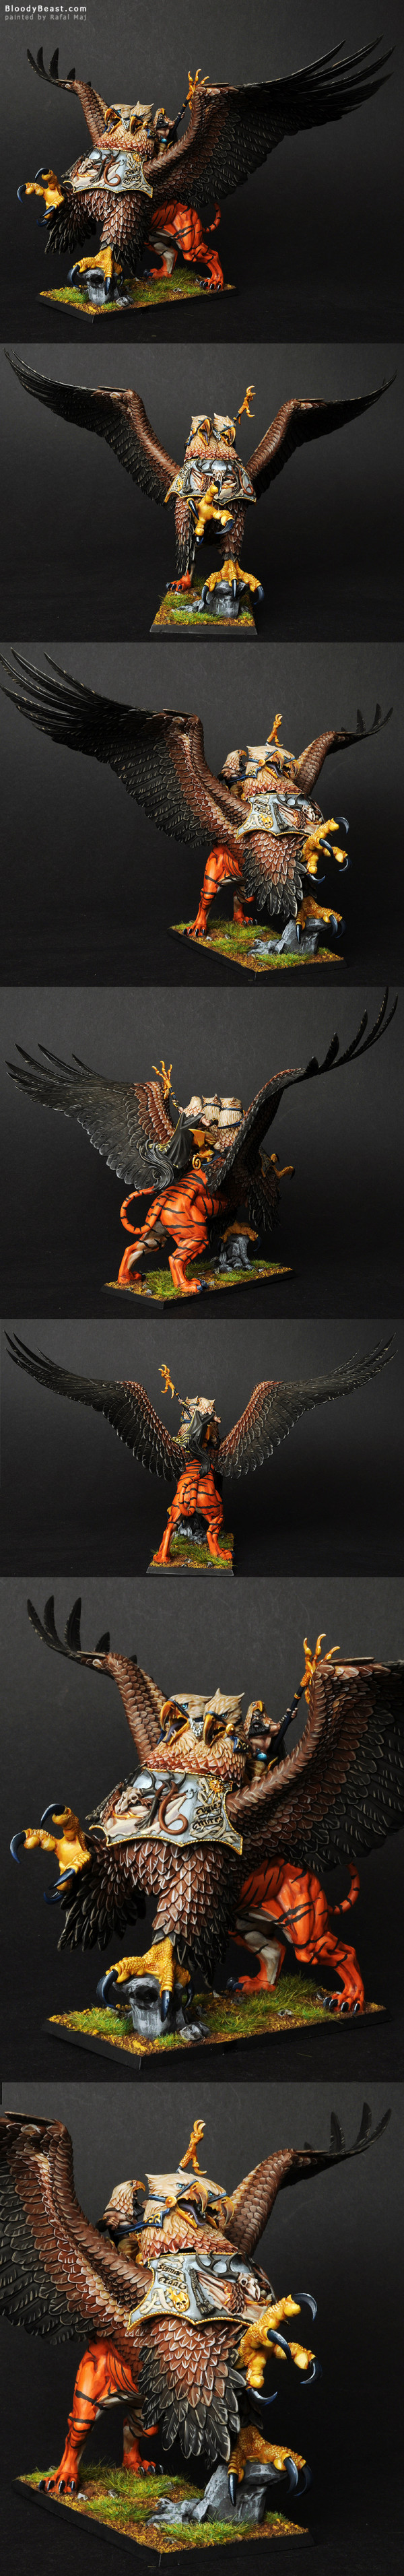 Empire Amber Battle Wizard Lord on Griffon painted by Rafal Maj (BloodyBeast.com)